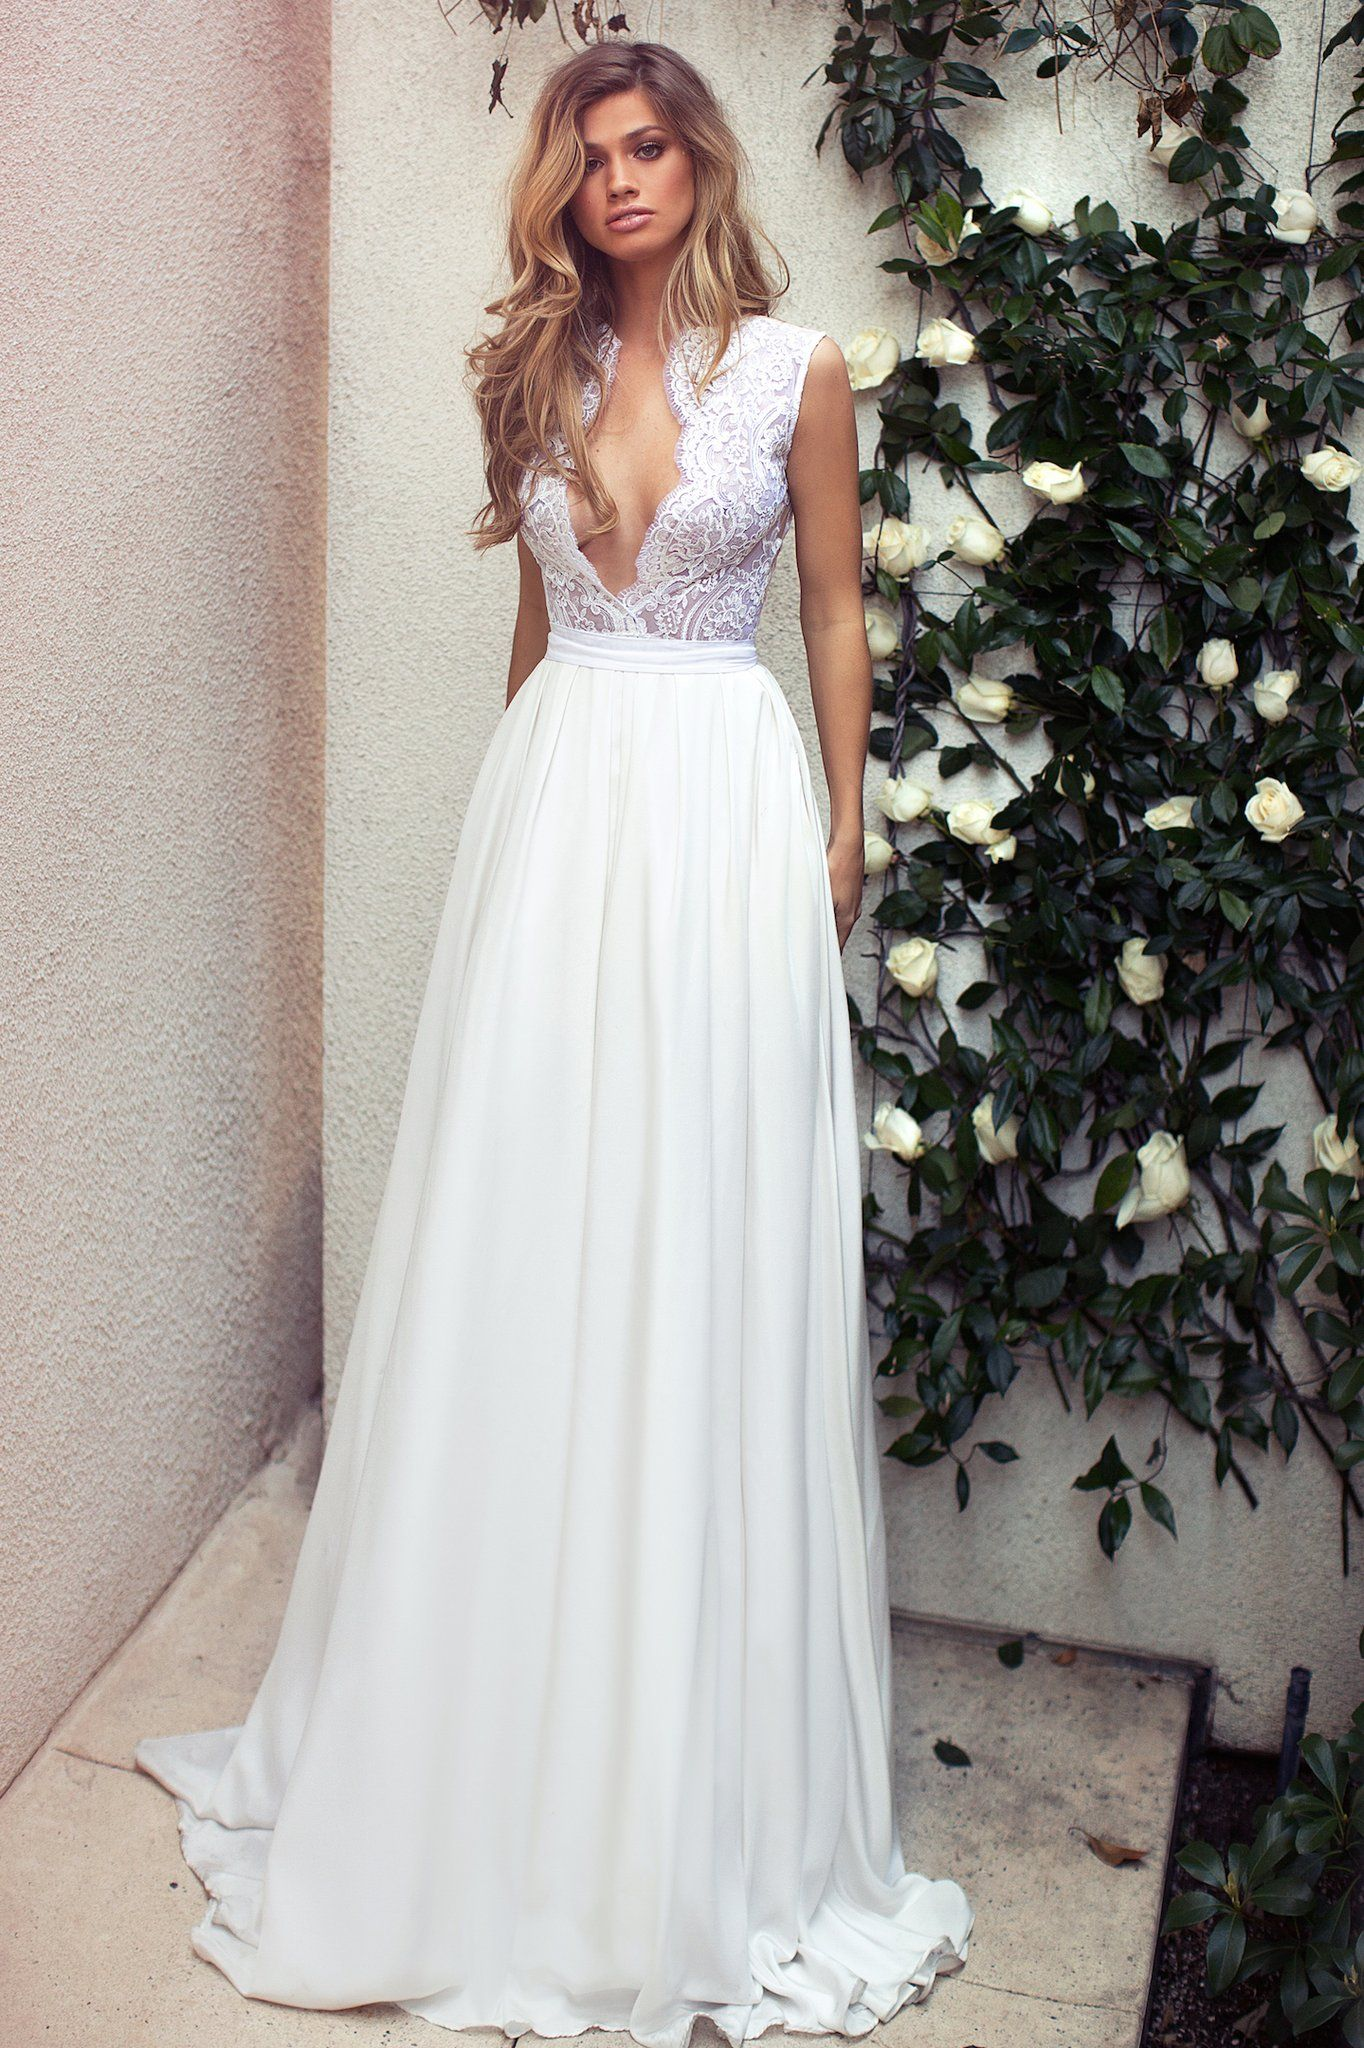 Add on sleeves for wedding dresses  BELLE LOOKBOOK u Lurelly  Fucking itus happening  Pinterest